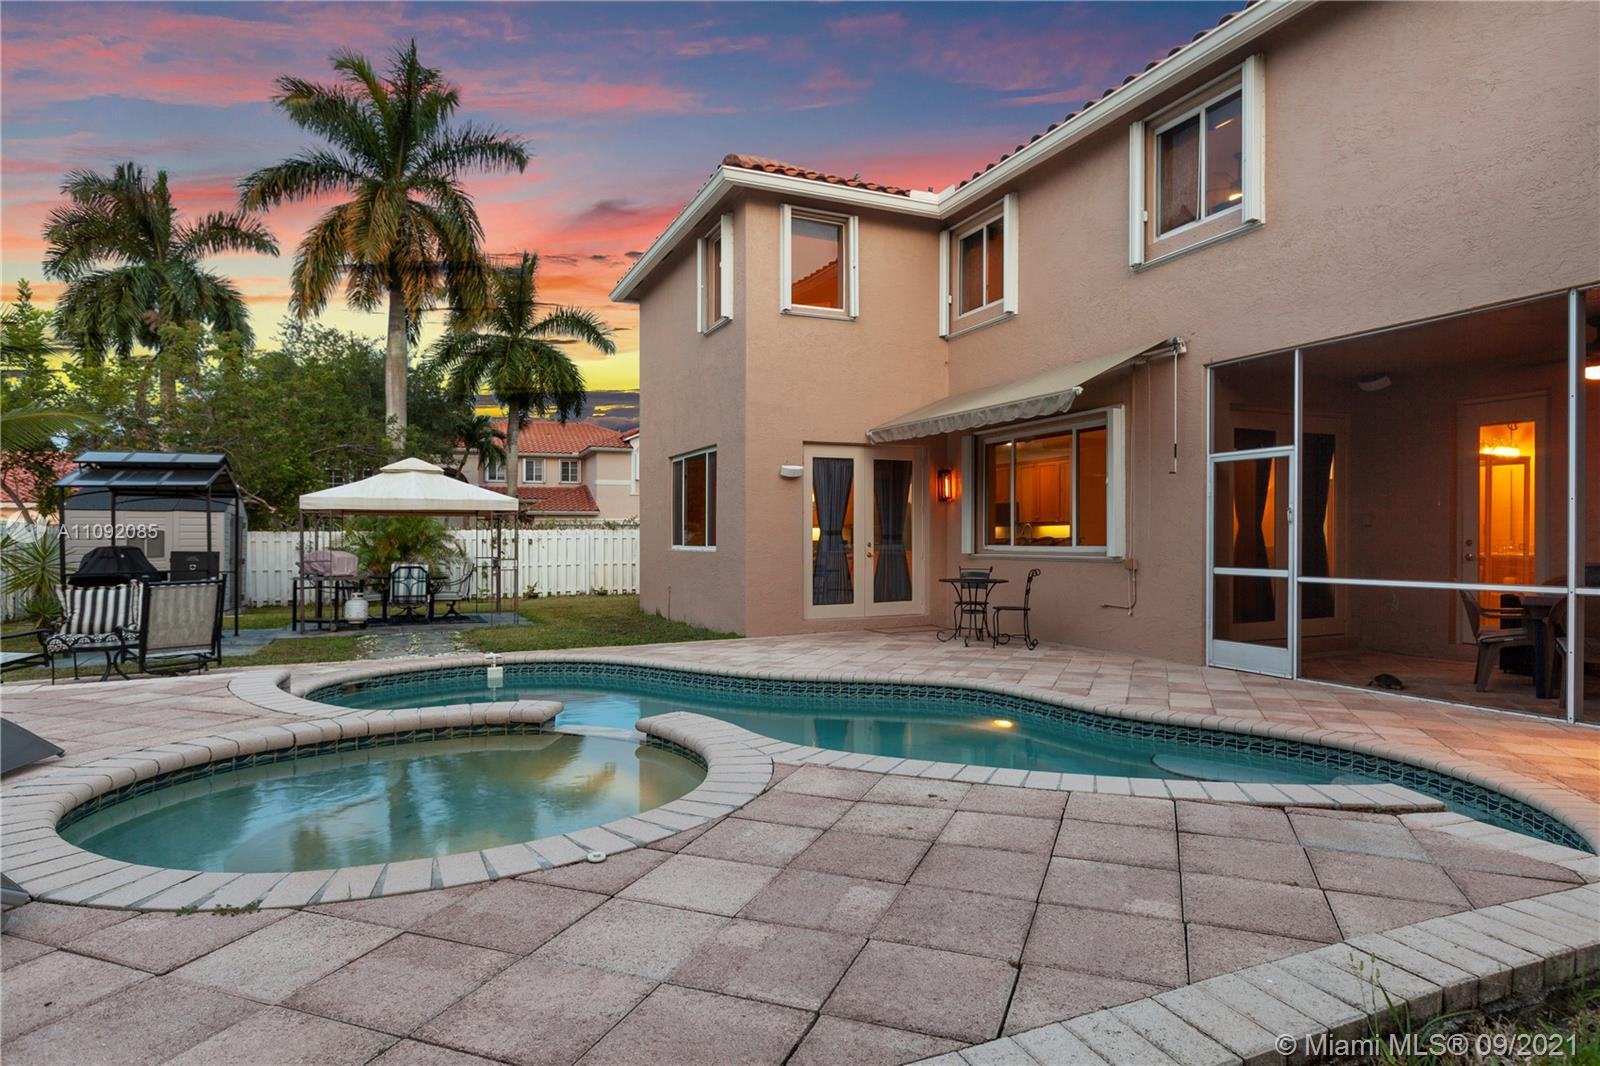 14501 39th St, Miramar, Florida 33027